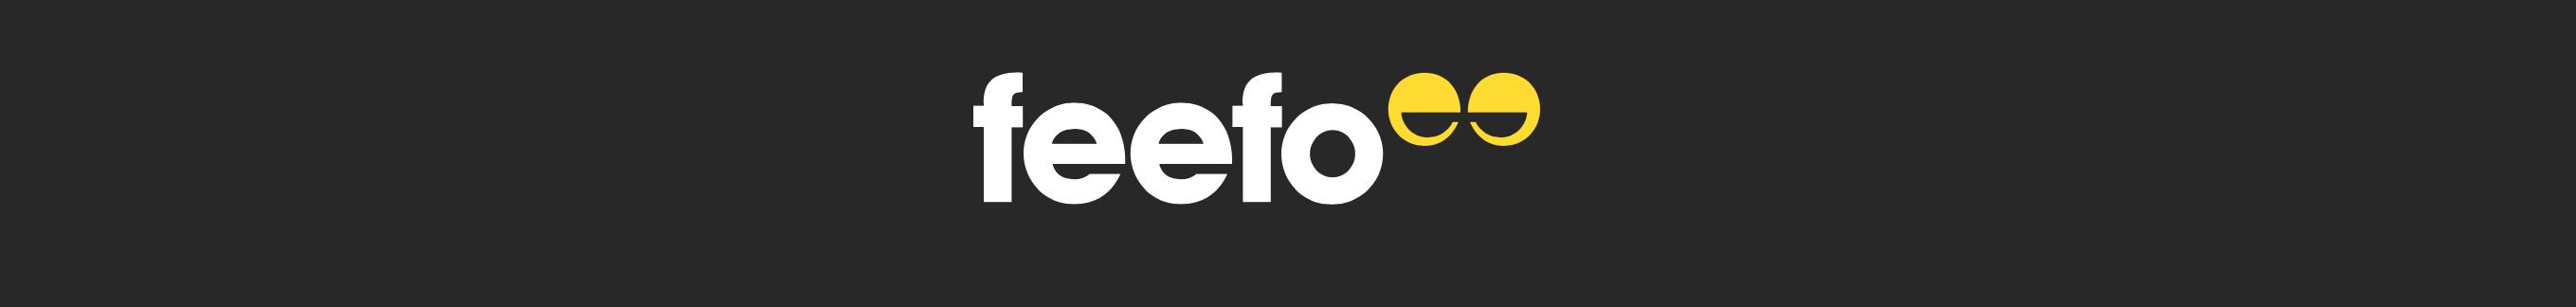 feefo partnership